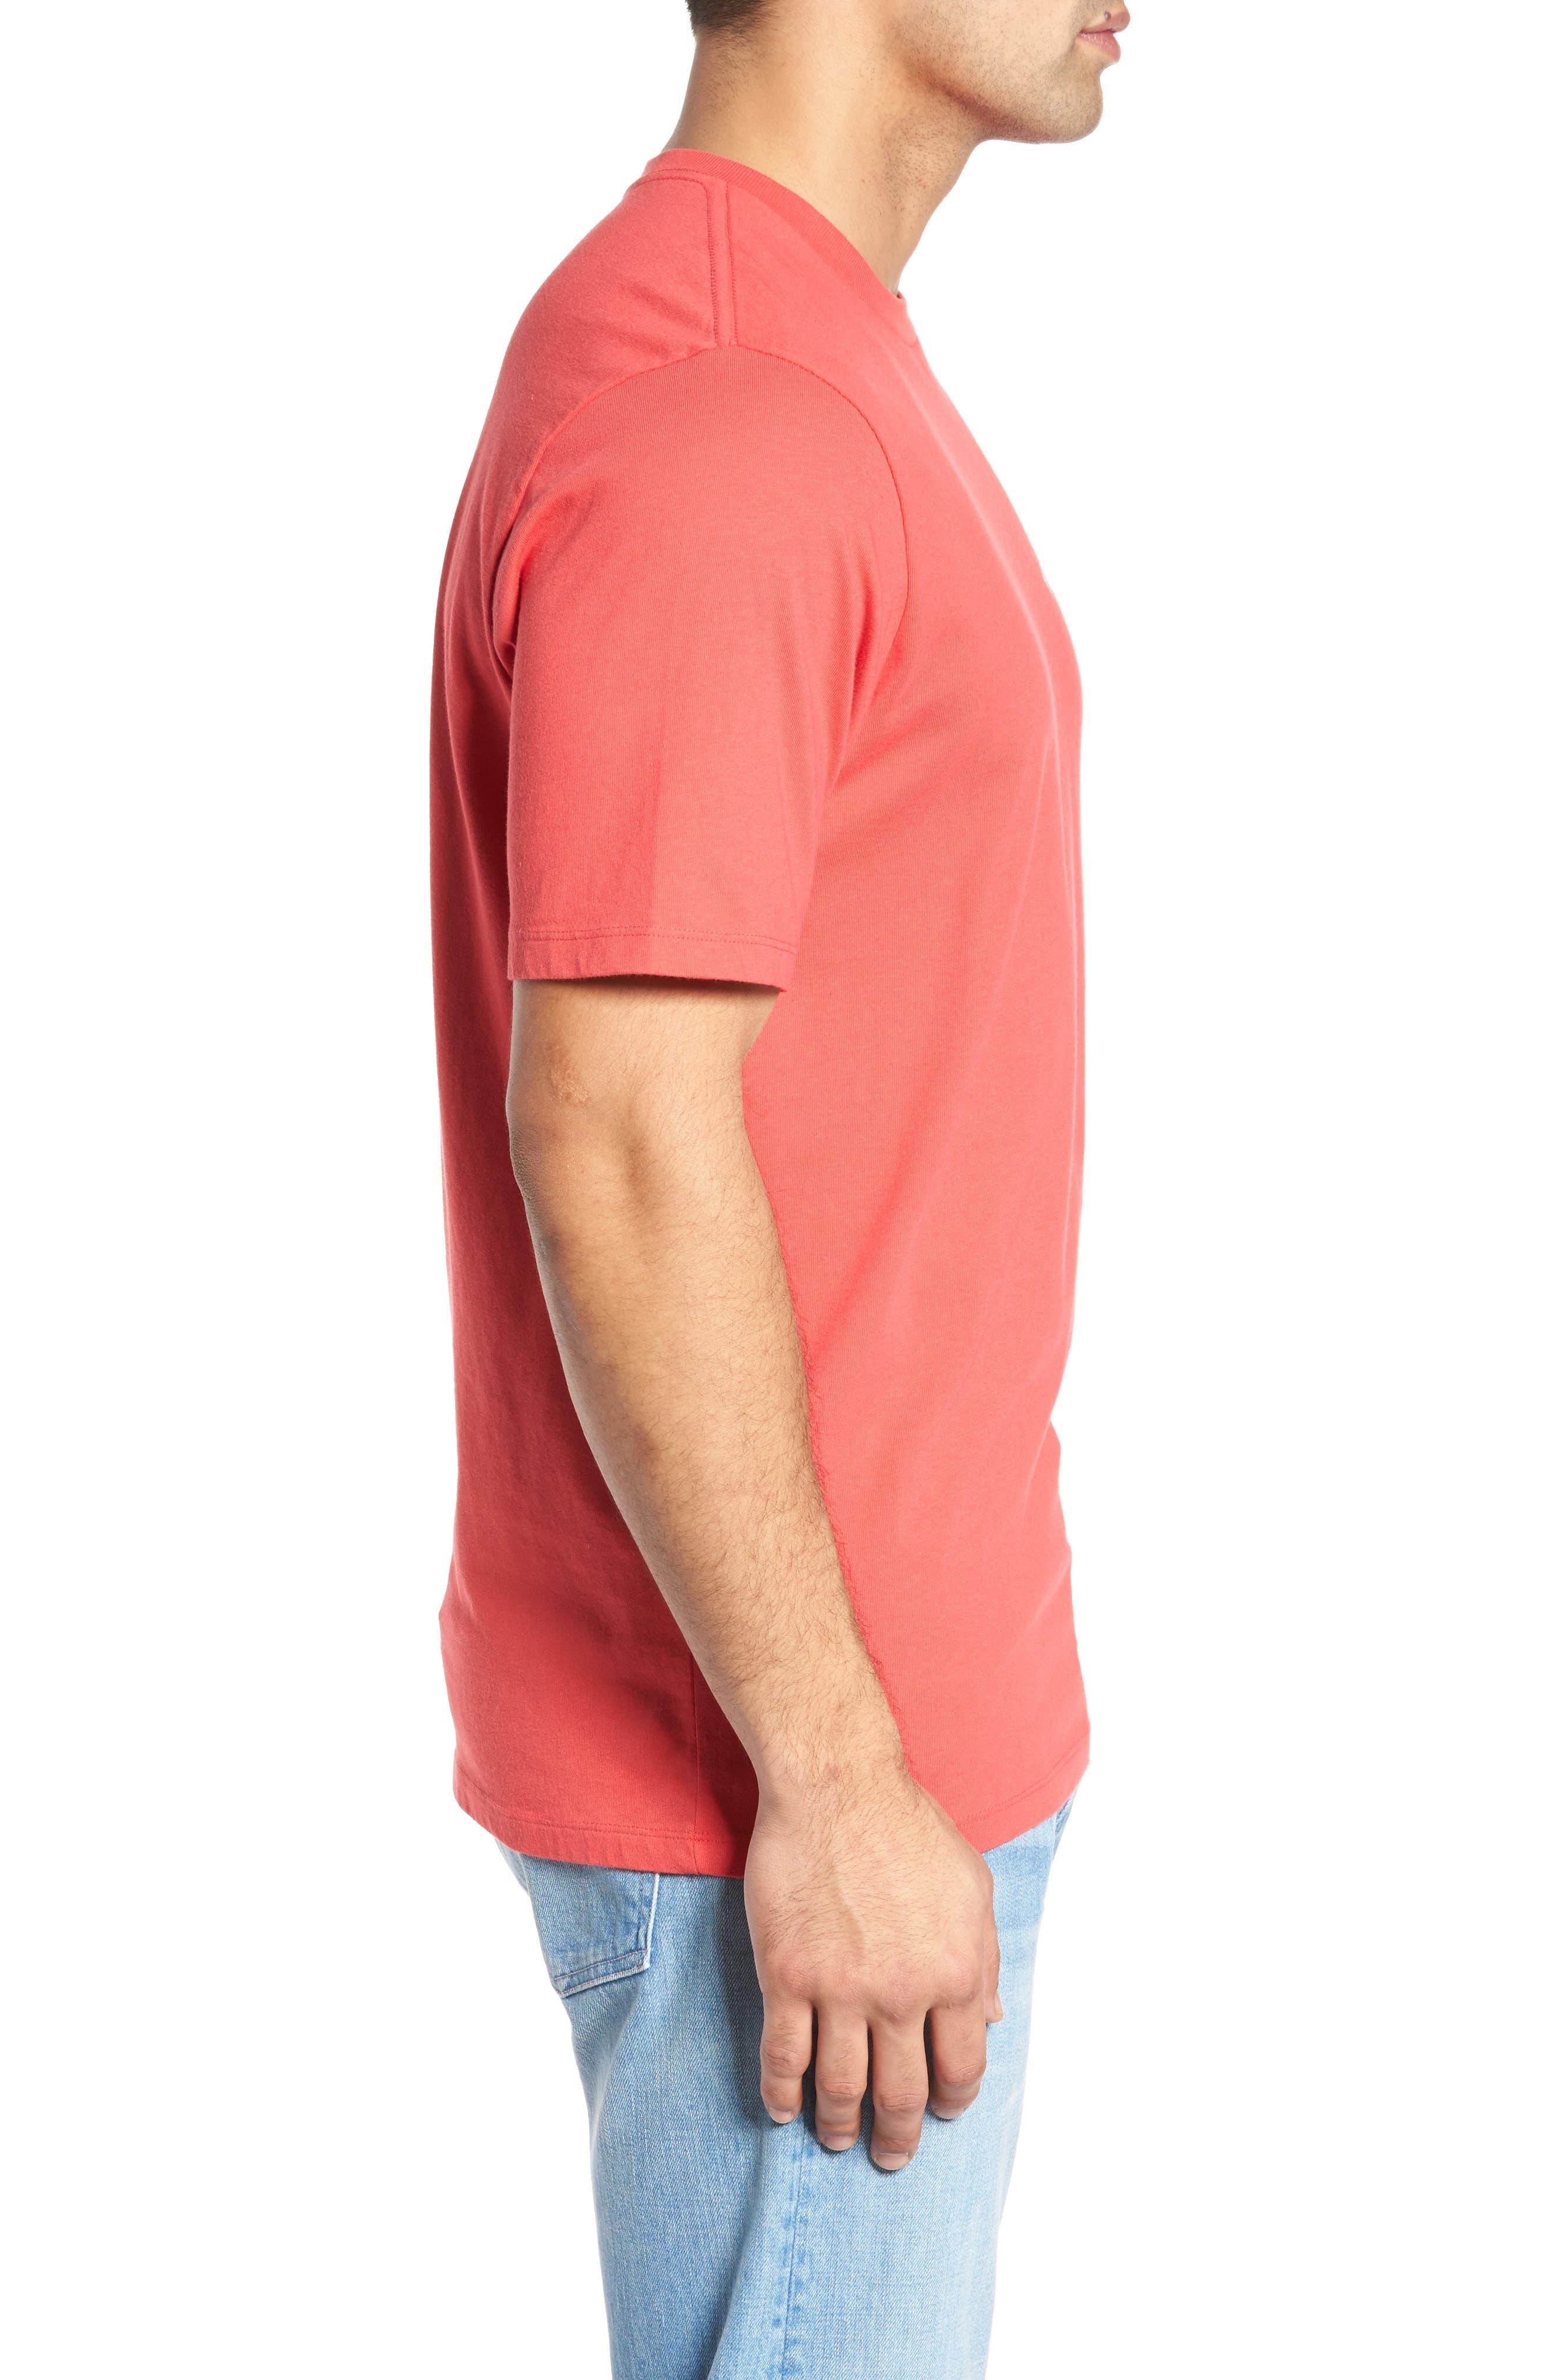 Grate Outdoors T-Shirt,                             Alternate thumbnail 3, color,                             Pomodoro